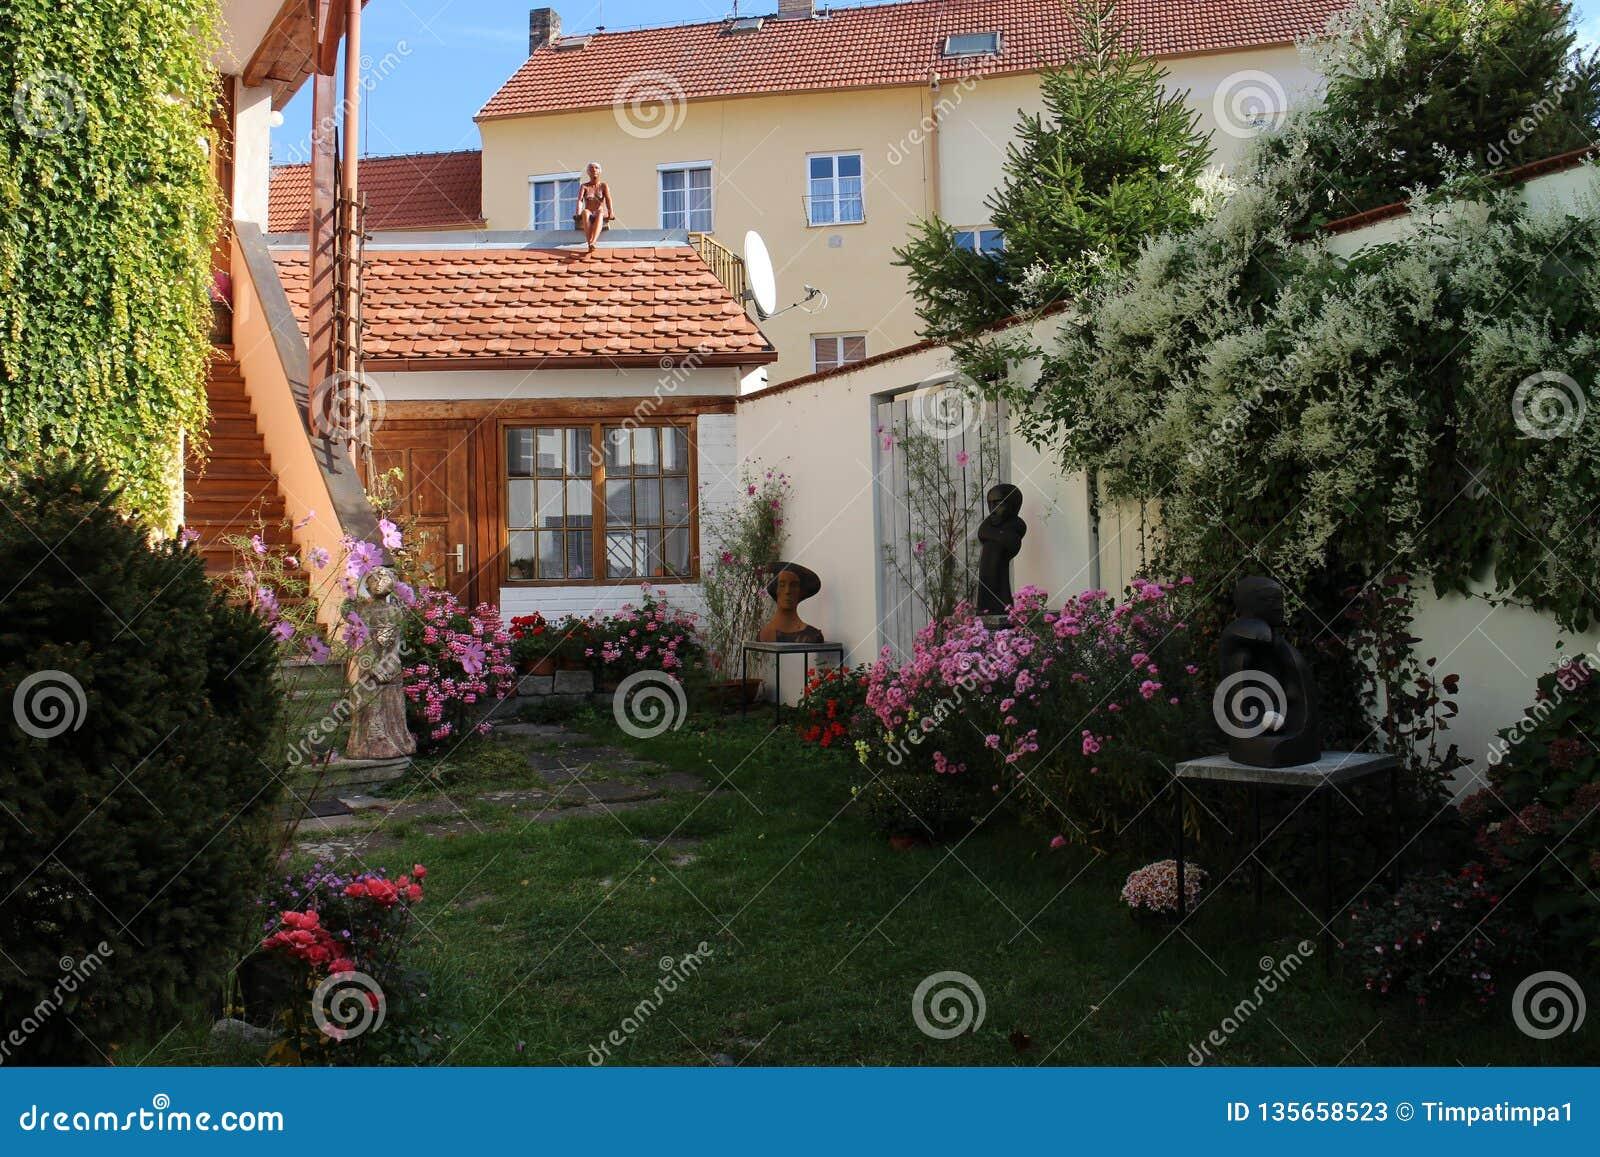 Small courtyard of family house in centre of České Budějovice, South Bohemia